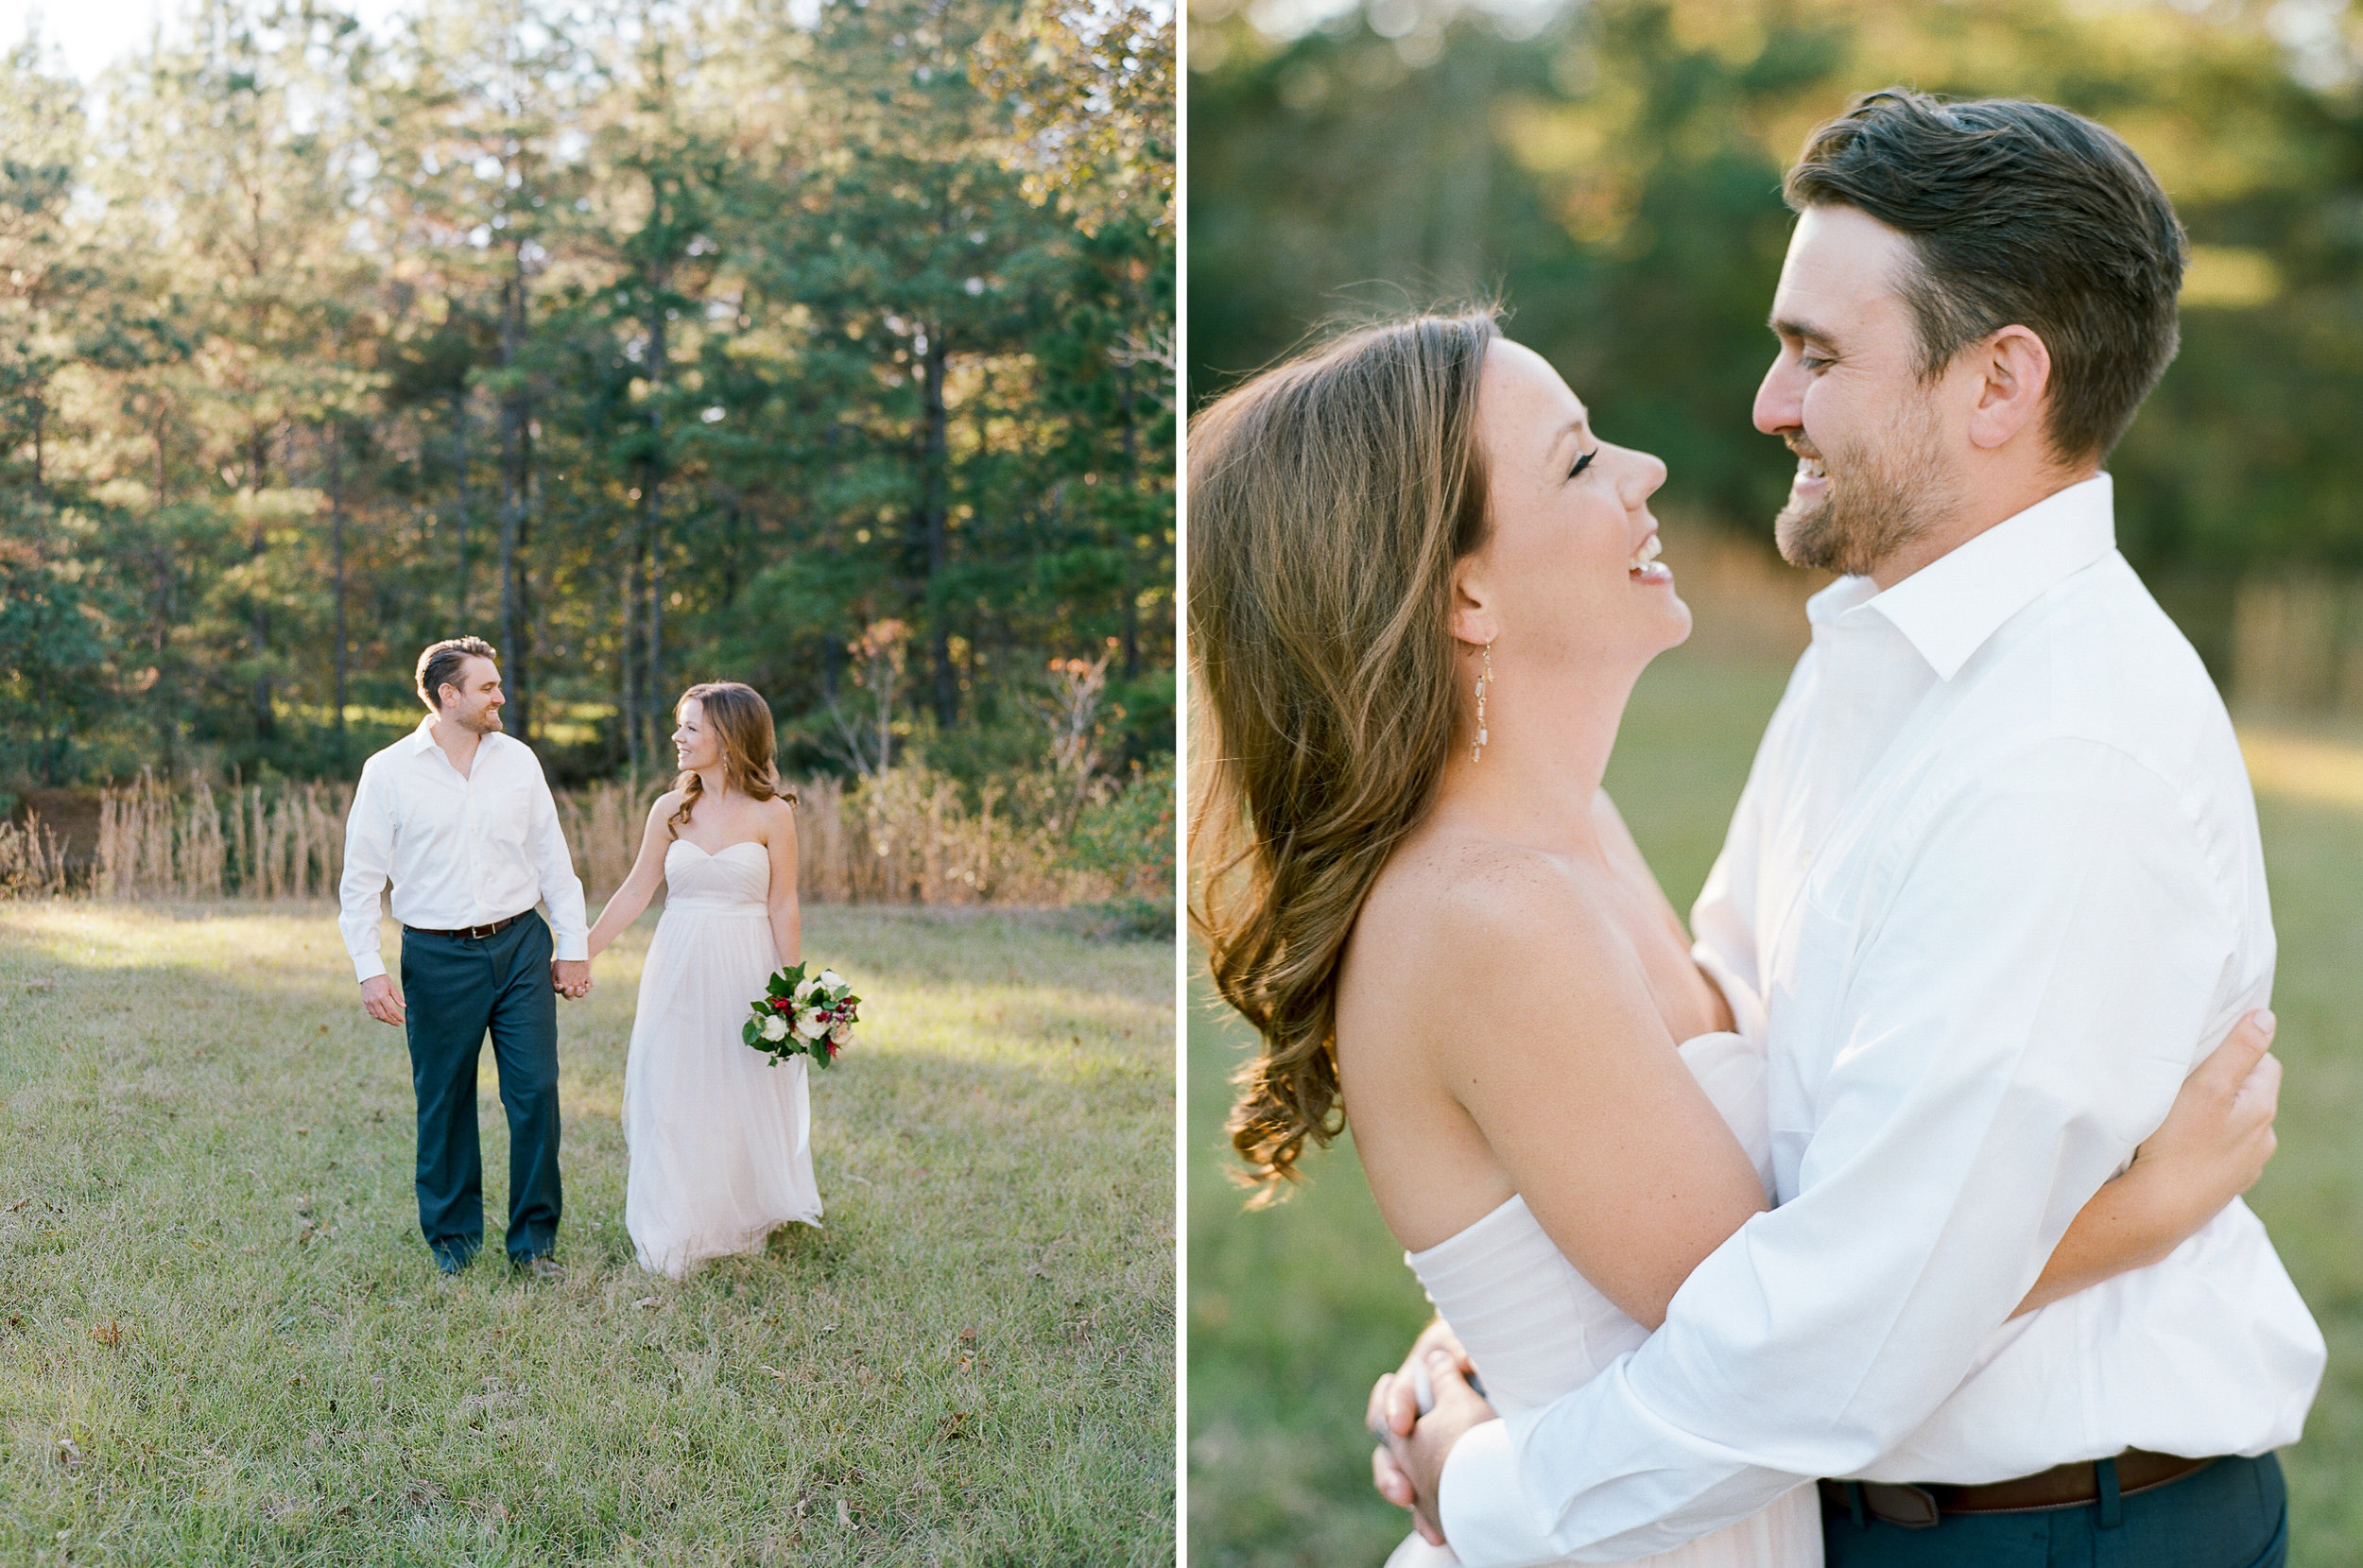 dana-fernandez-photography-houston-wedding-photographer-portraits-engagements-anniversary-session-film-photographer-austin-wedding-photographer-115.jpg